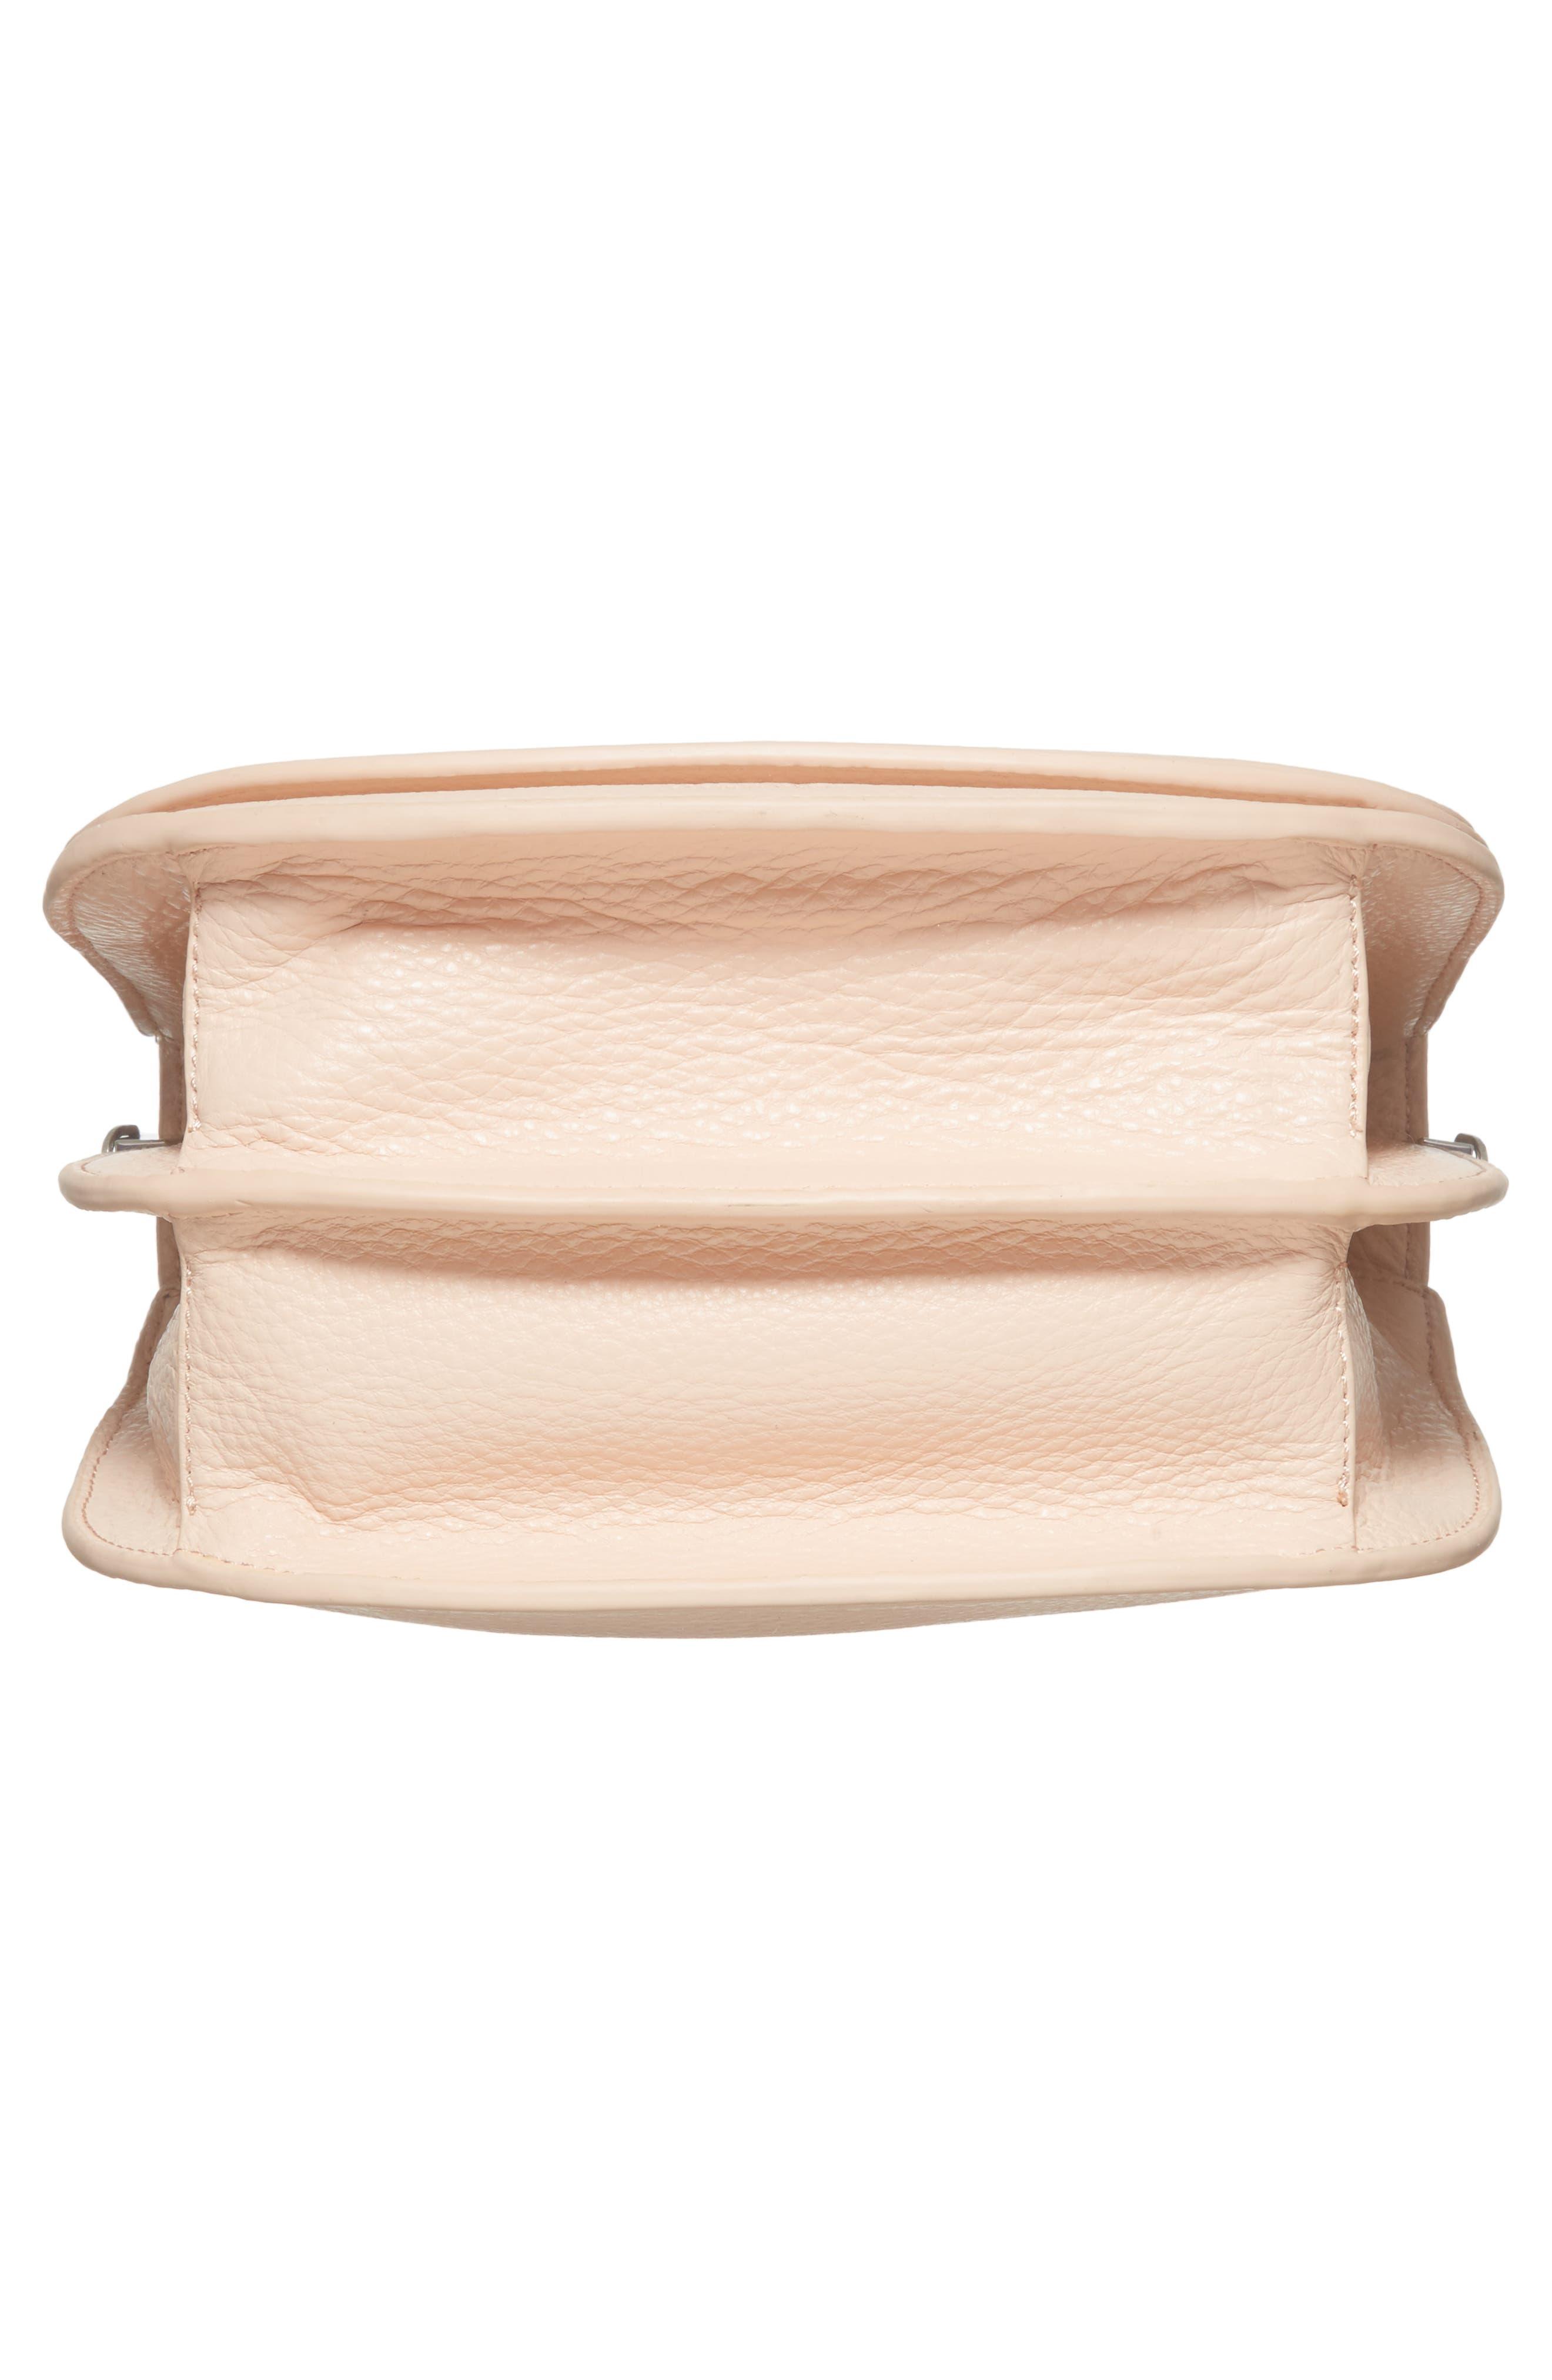 Landon Leather Crossbody Saddle Bag,                             Alternate thumbnail 23, color,